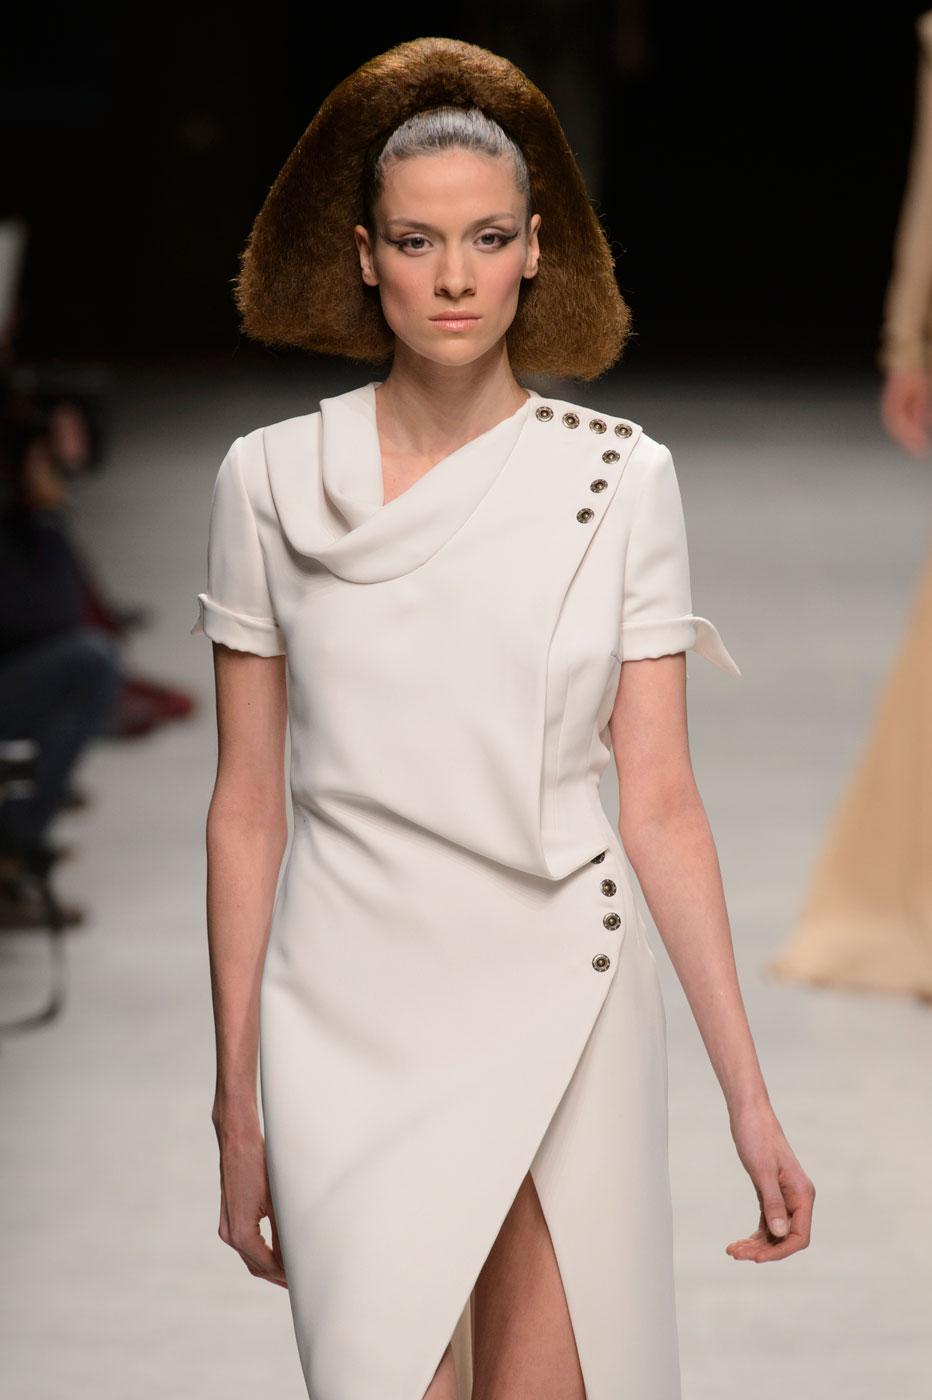 Julien-Fournie-Prive-fashion-runway-show-haute-couture-paris-spring-2015-the-impression-29